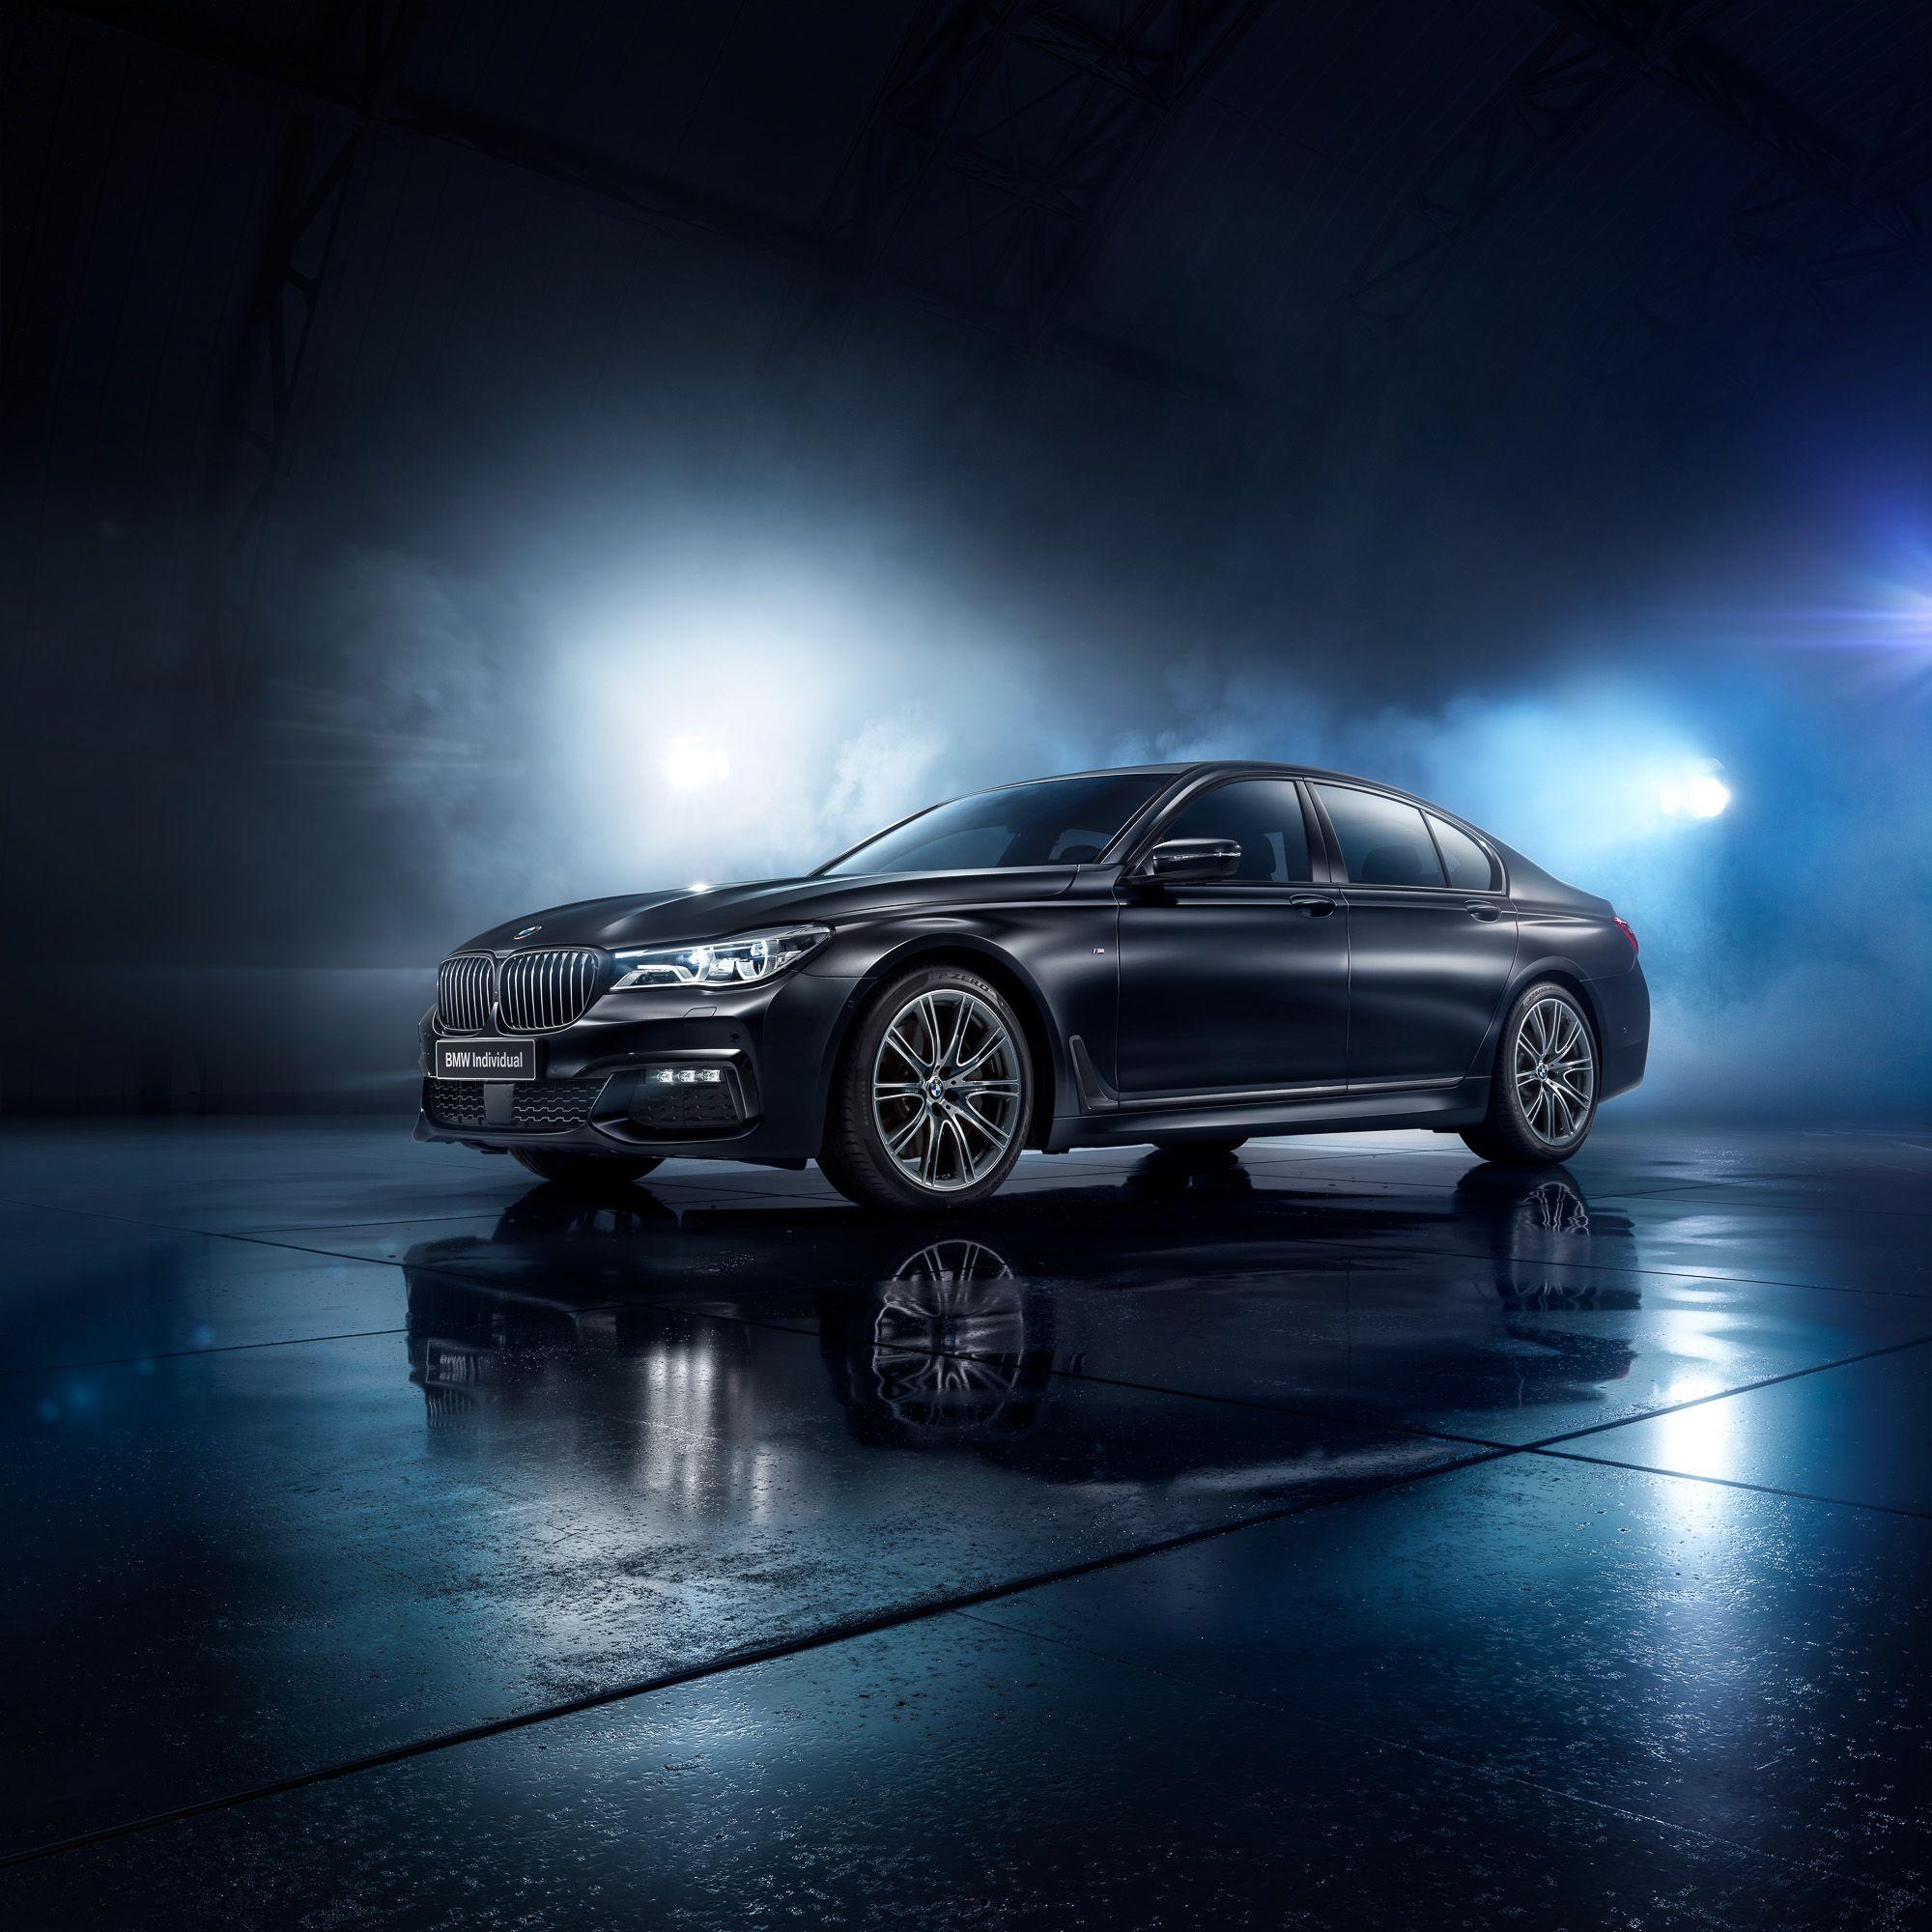 Wallpaper Bmw 7 Series Black Ice Edition 2017 4k: Ознакомьтесь с этим проектом @Behance: «BMW 7 BLACK ICE